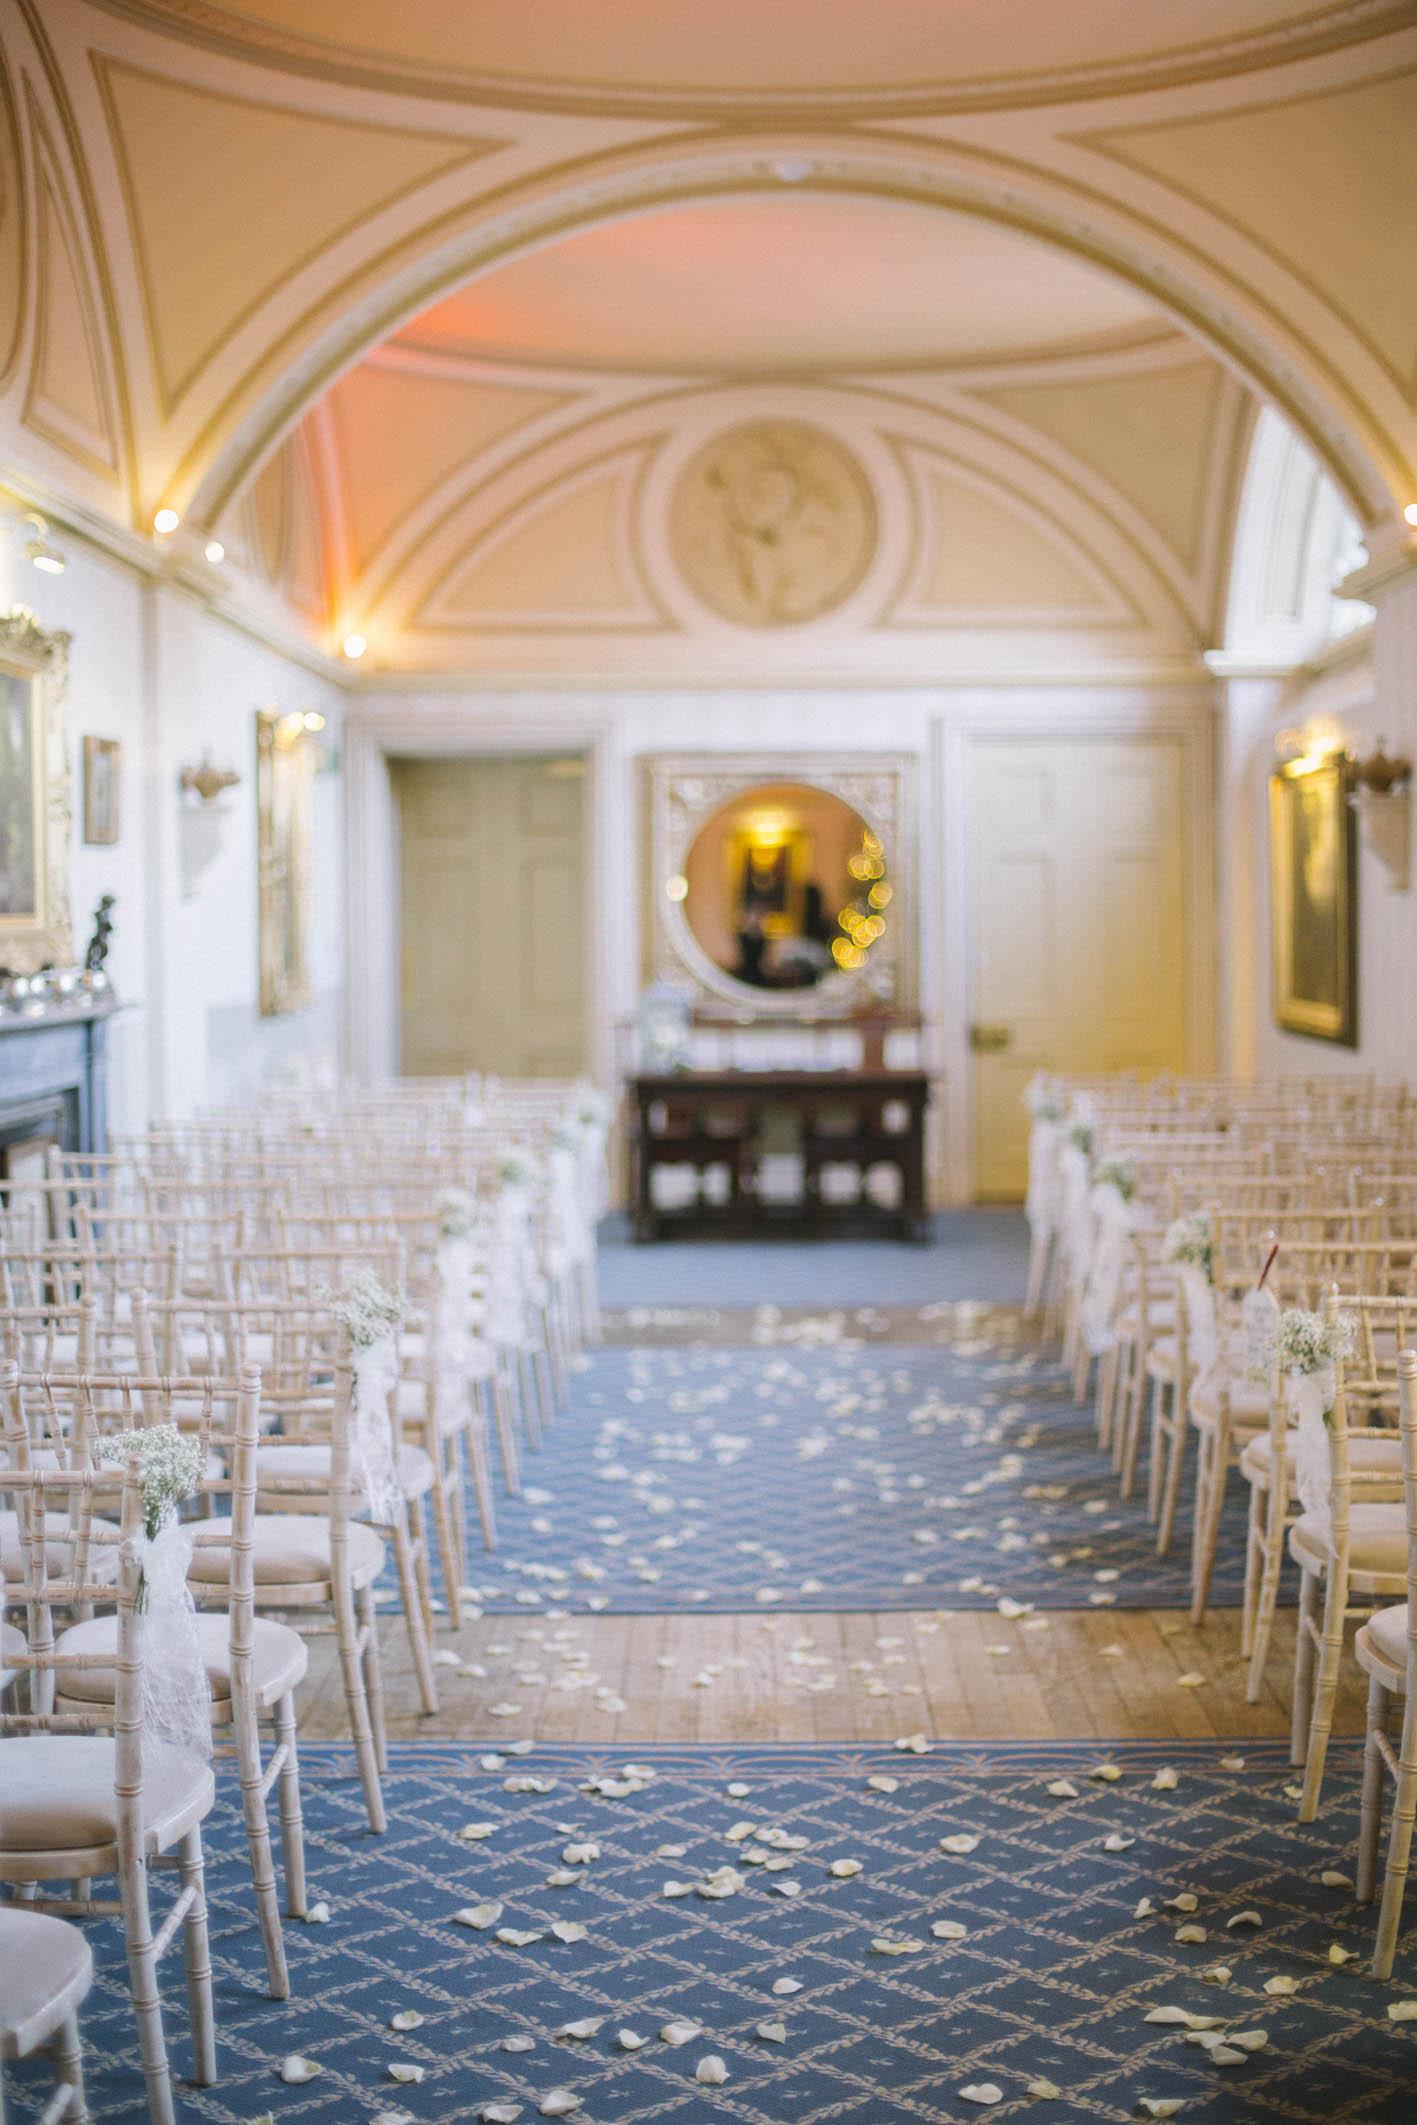 Balbirnie House Wedding Photography by Ceranna, Edinburgh based Wedding and Elopement Photographer